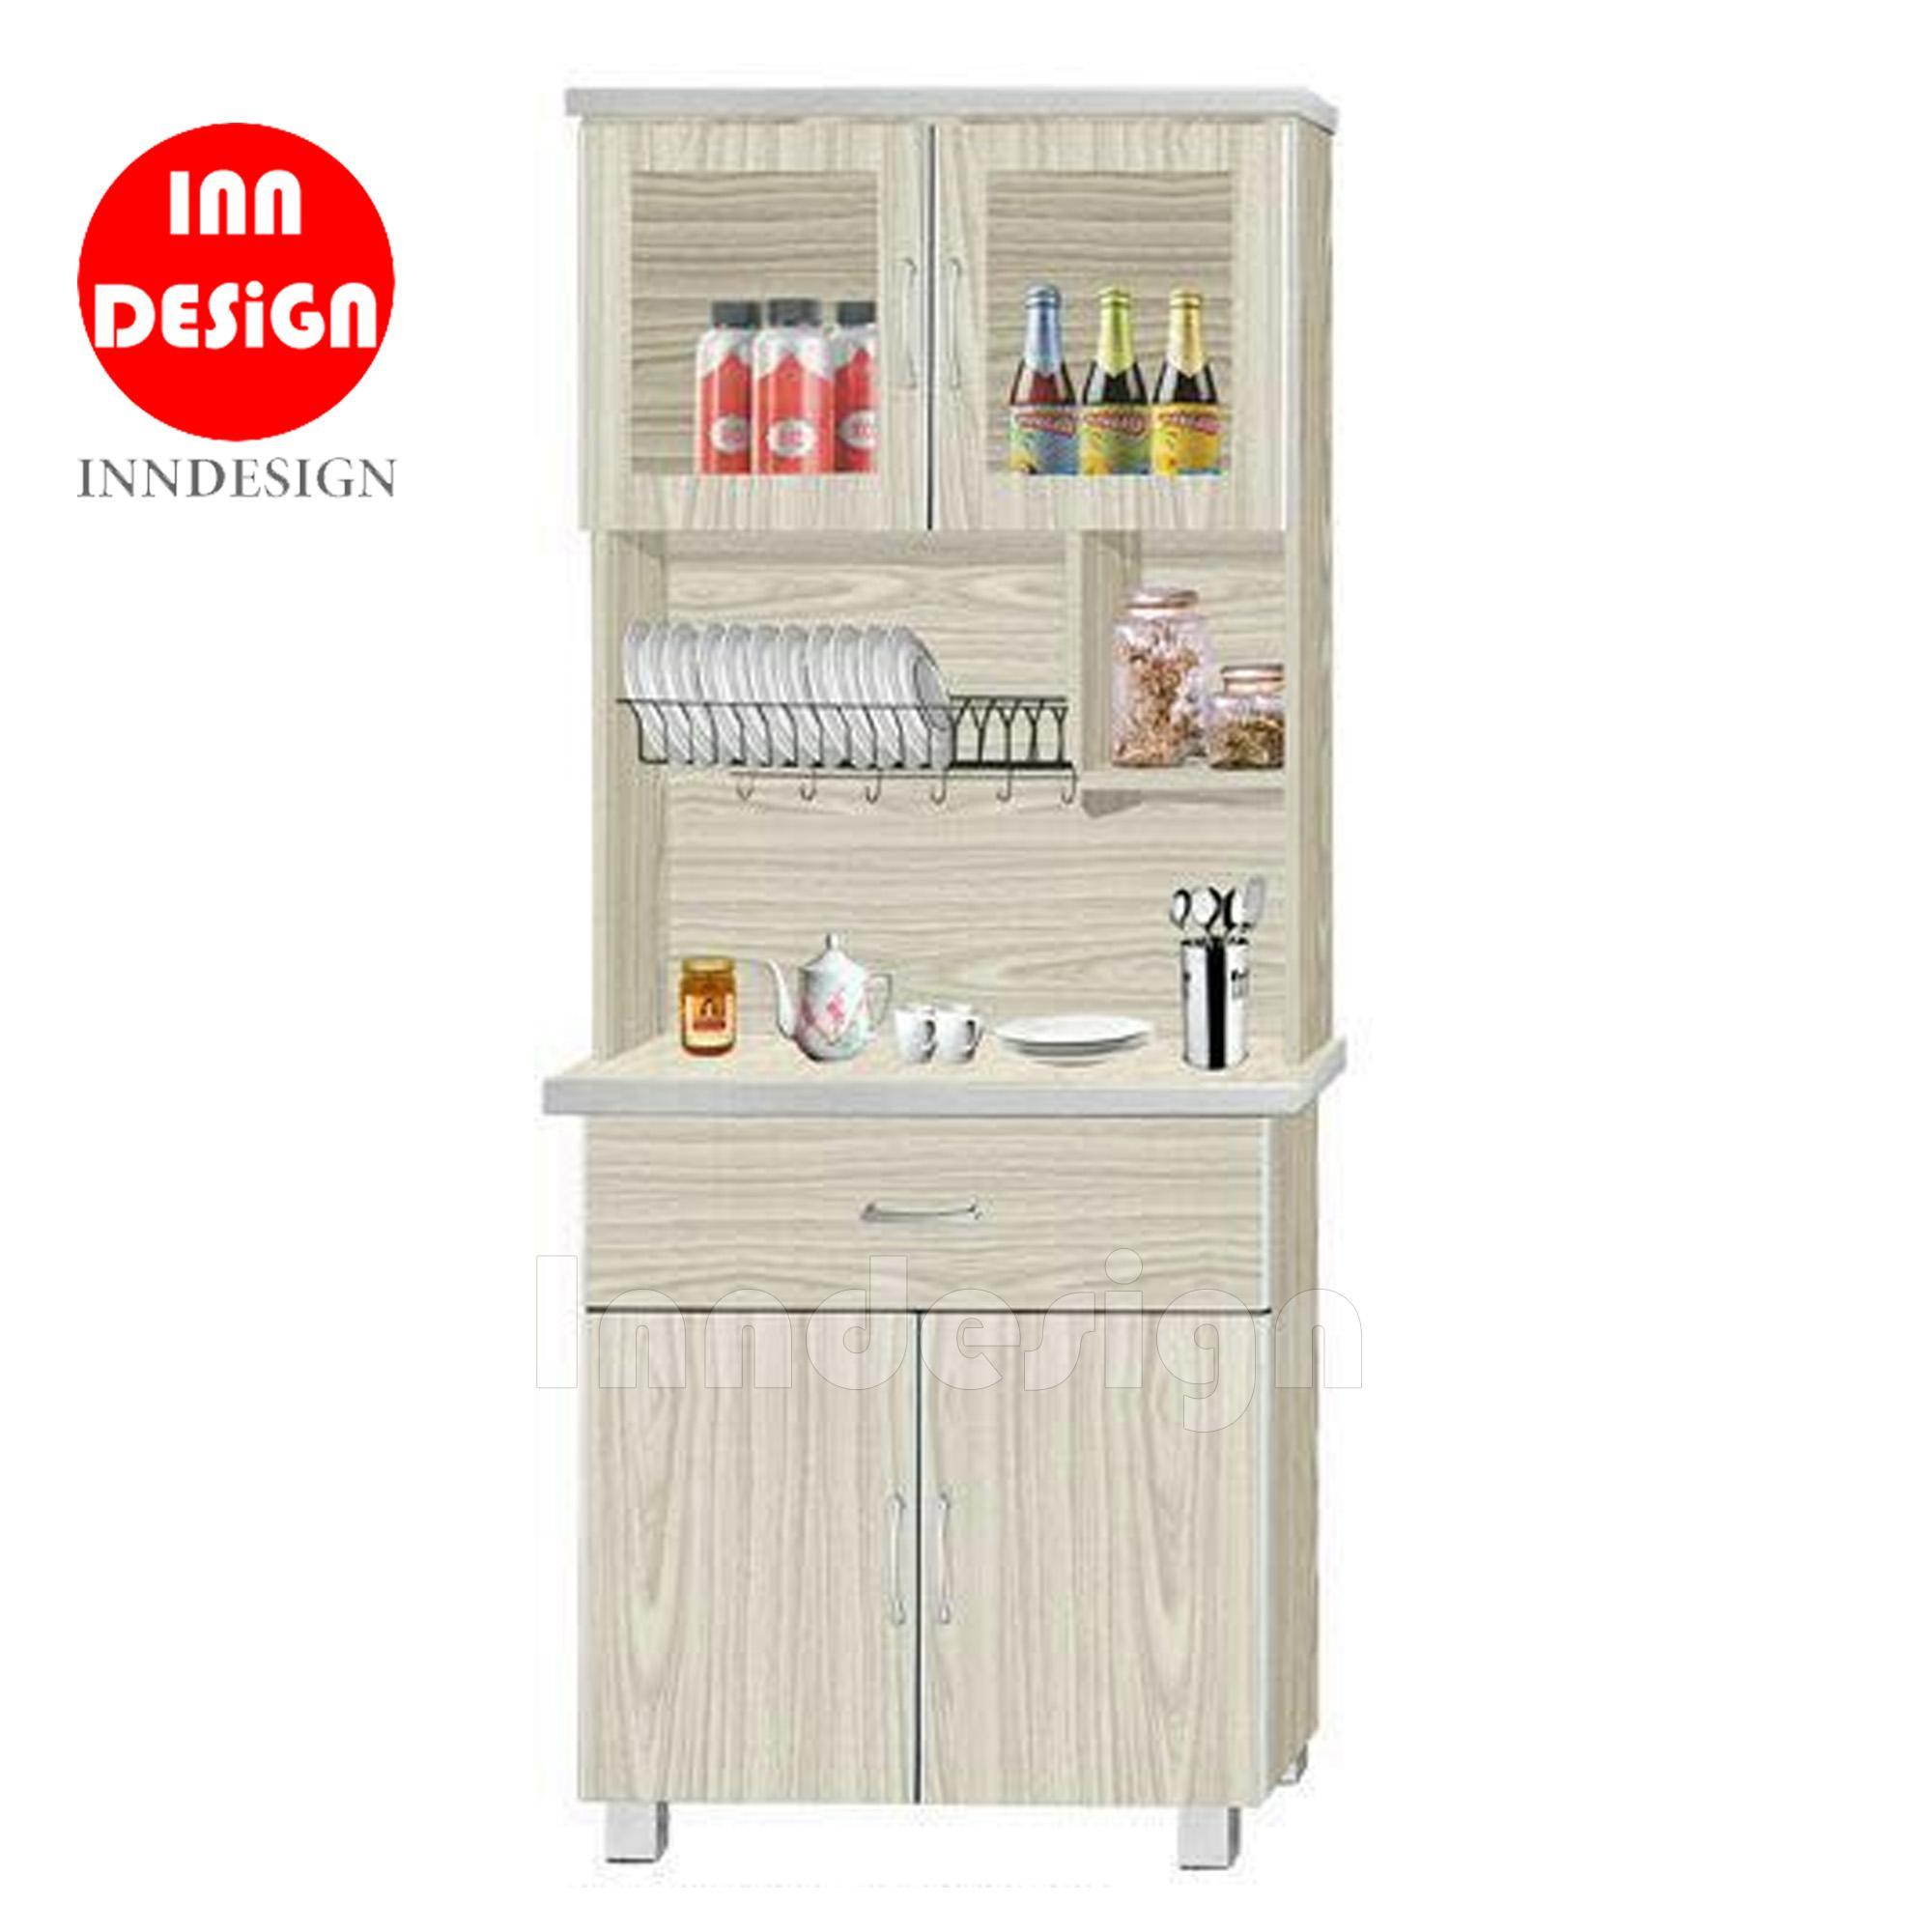 Don 2 Doors Stove Kitchen Cabinet + Top Storage (with Ceramic Tiles Top)